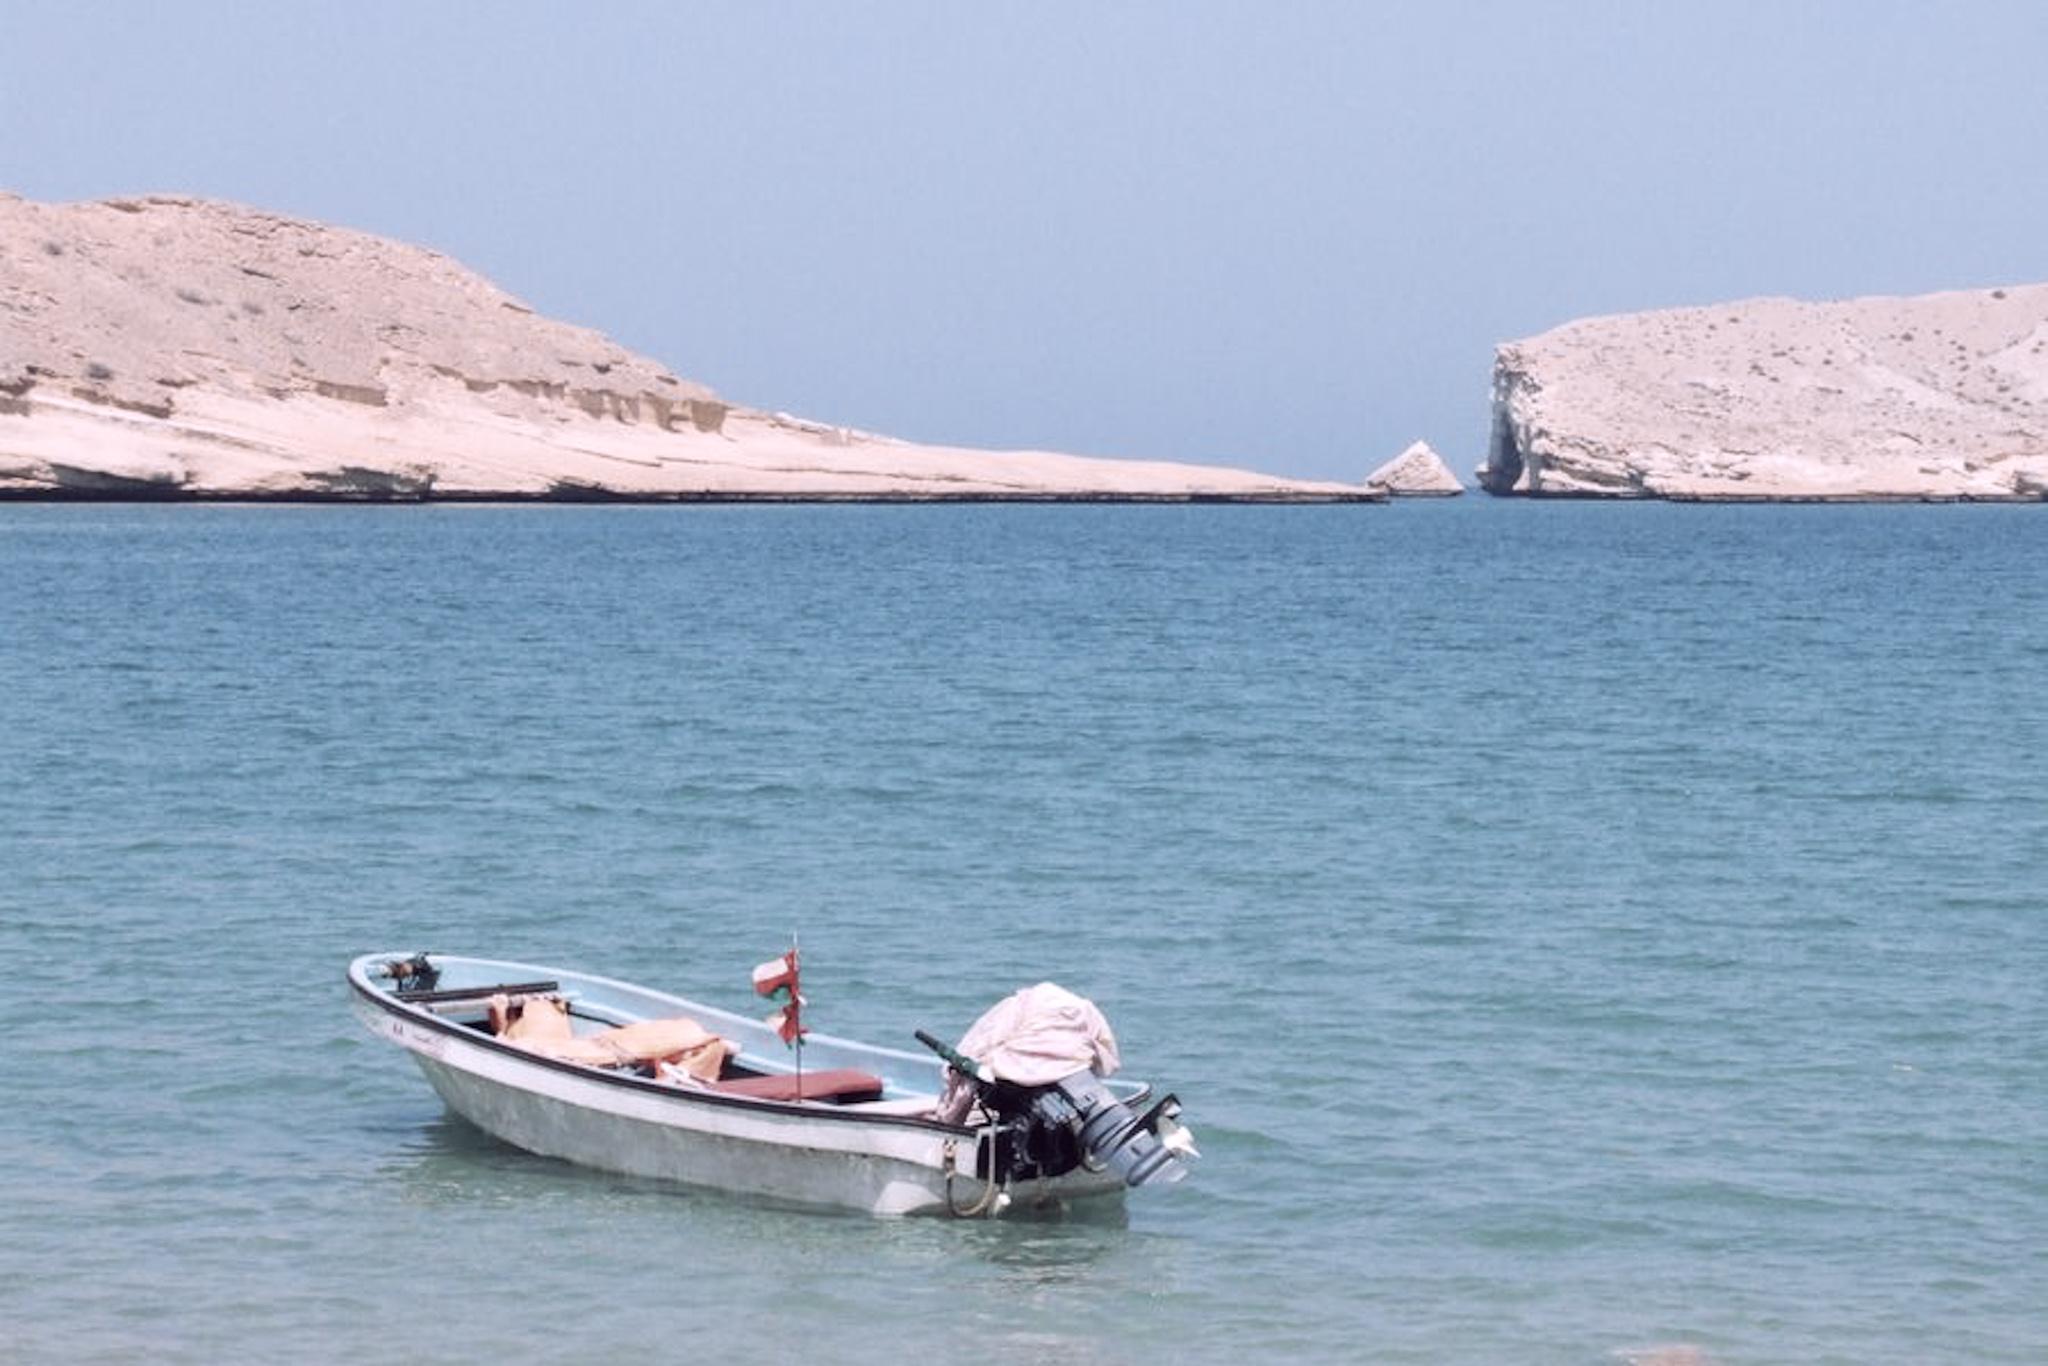 South Muscat coastline